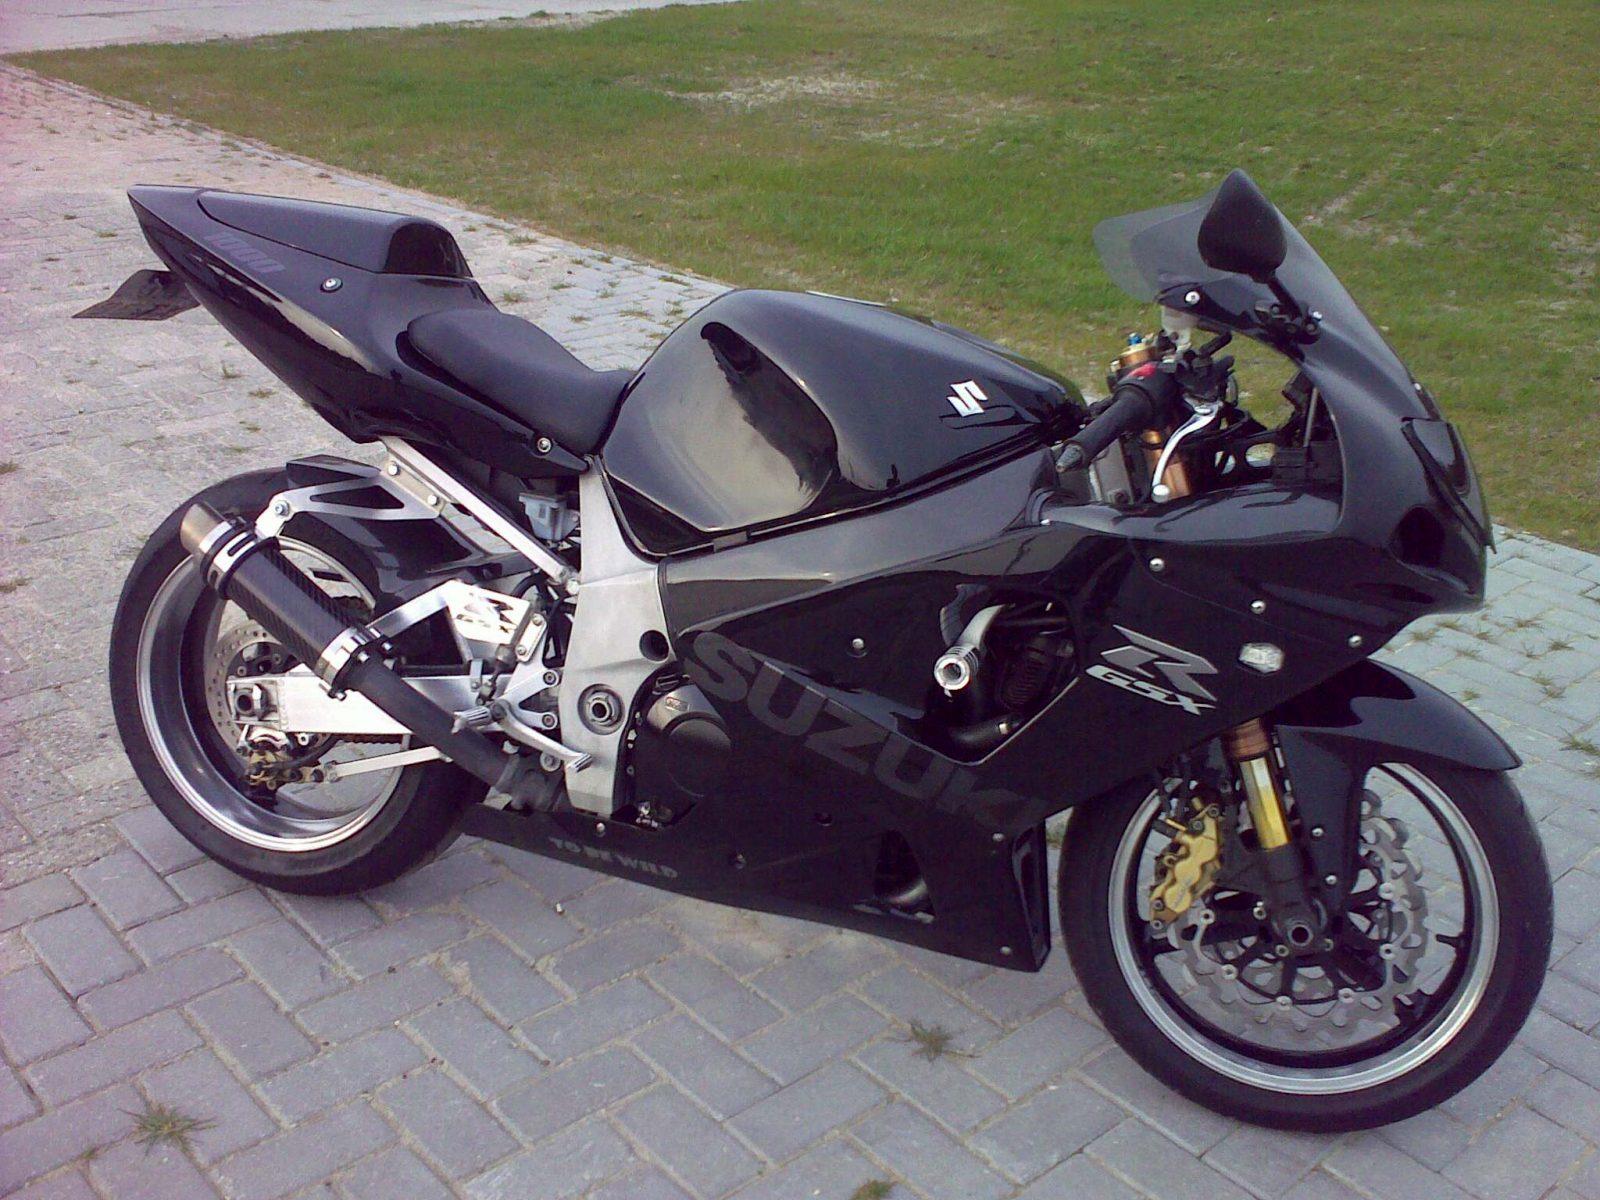 "Suzuki GSXR 1000 2001-2004<p>A16 Moto GP Carbon Exhaust with Titanium Type Slashcut Outlet</p><br><a href=""https://a16roadnracesupplies.co.uk/product/a16-suzuki-exhausts/"">Buy now!</a>"